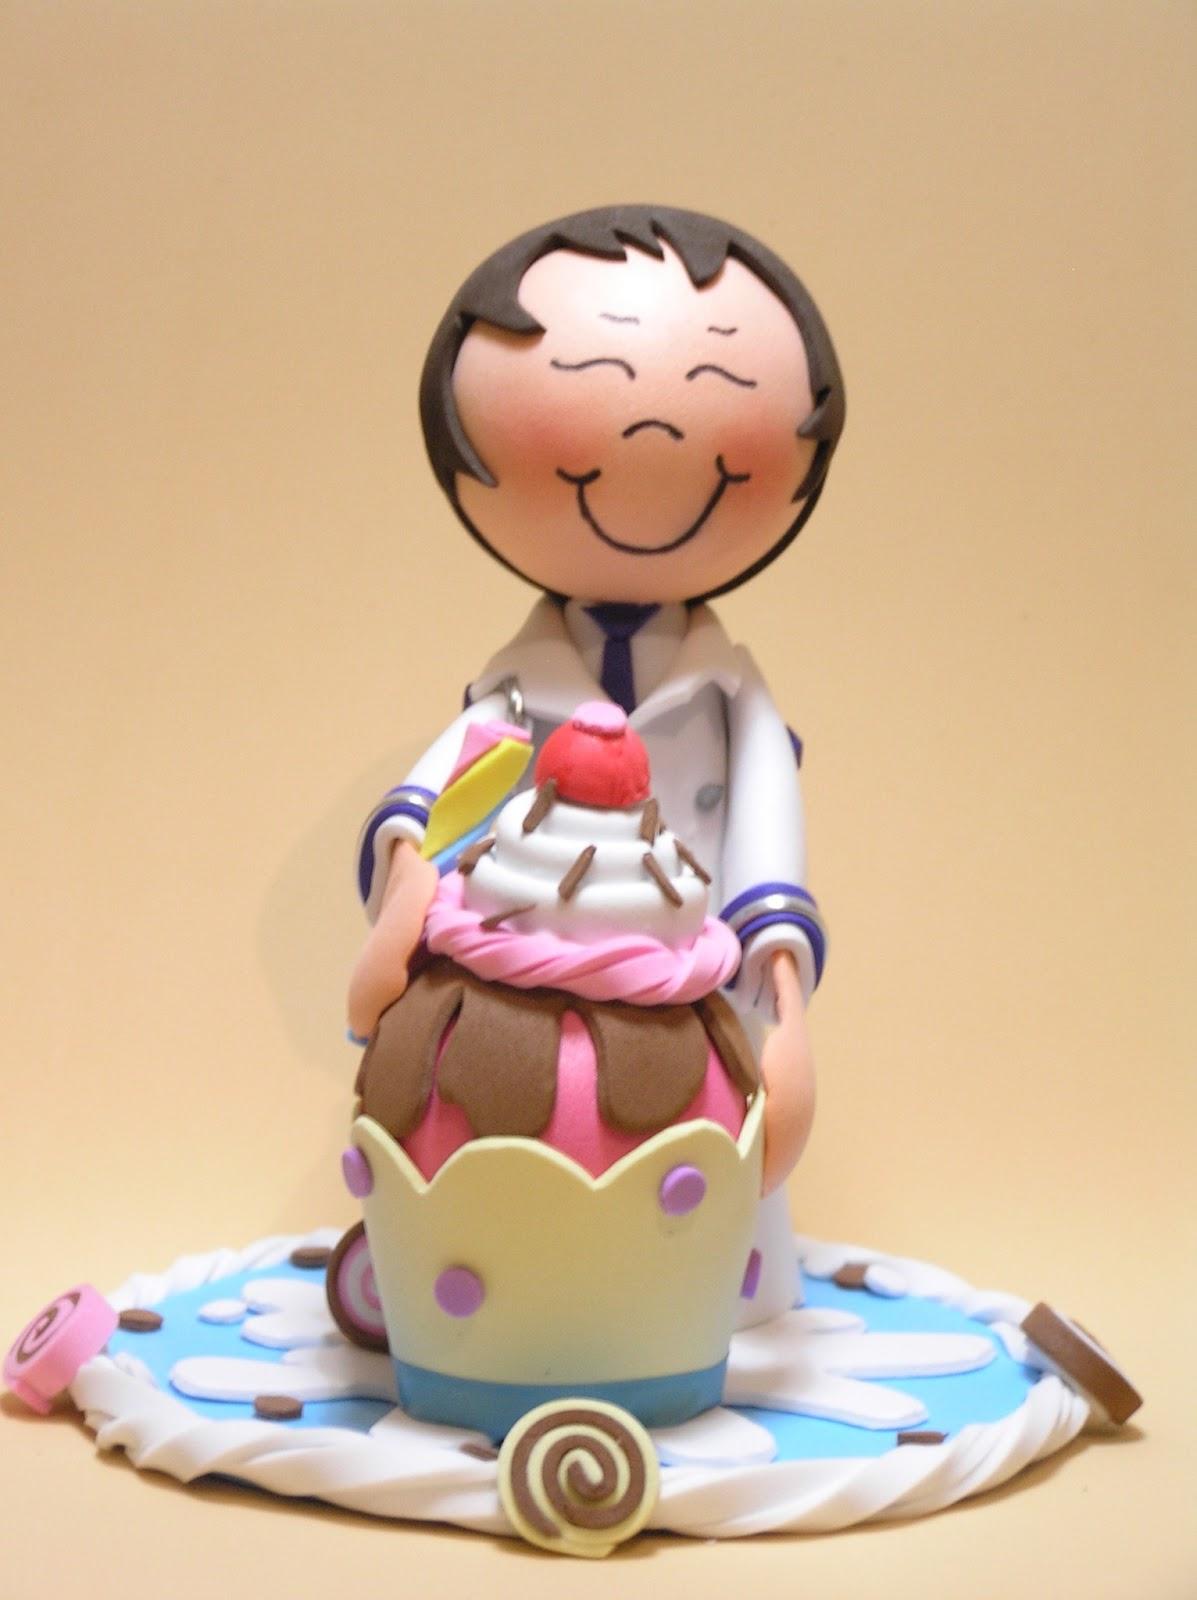 Para adornar tartas o mesa de celebraci n mu eco cupcake de comuni n pasaloda - Adornar mesas de comunion ...